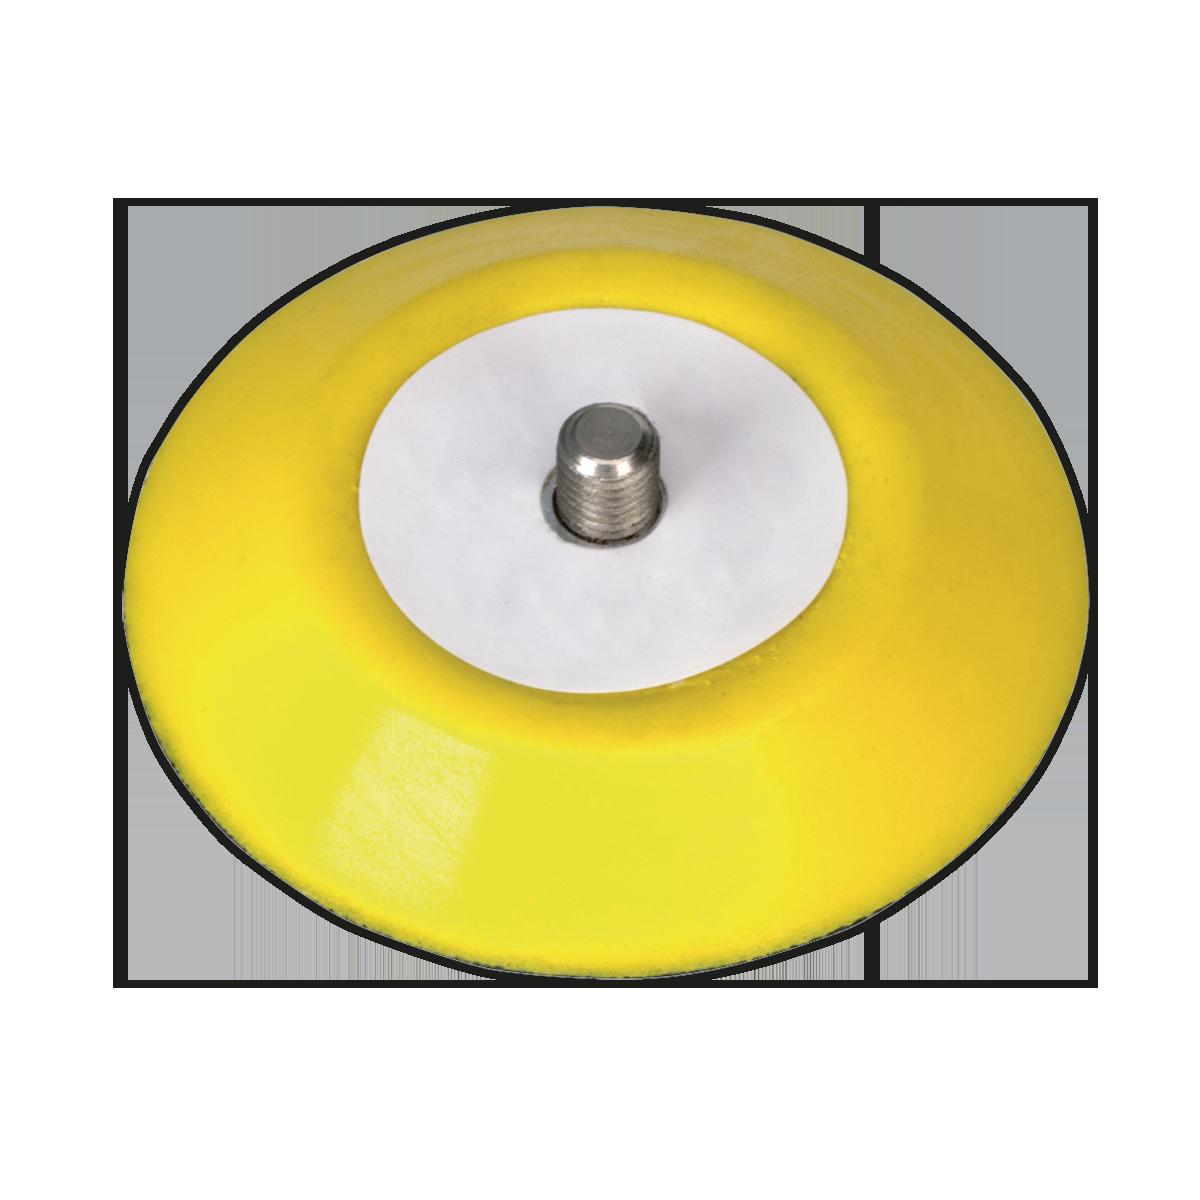 "PTC75VA516 Sealey Hook /& Loop Backing Pad Ø71mm 5//16/""UNC Backing Pads /& Nuts"